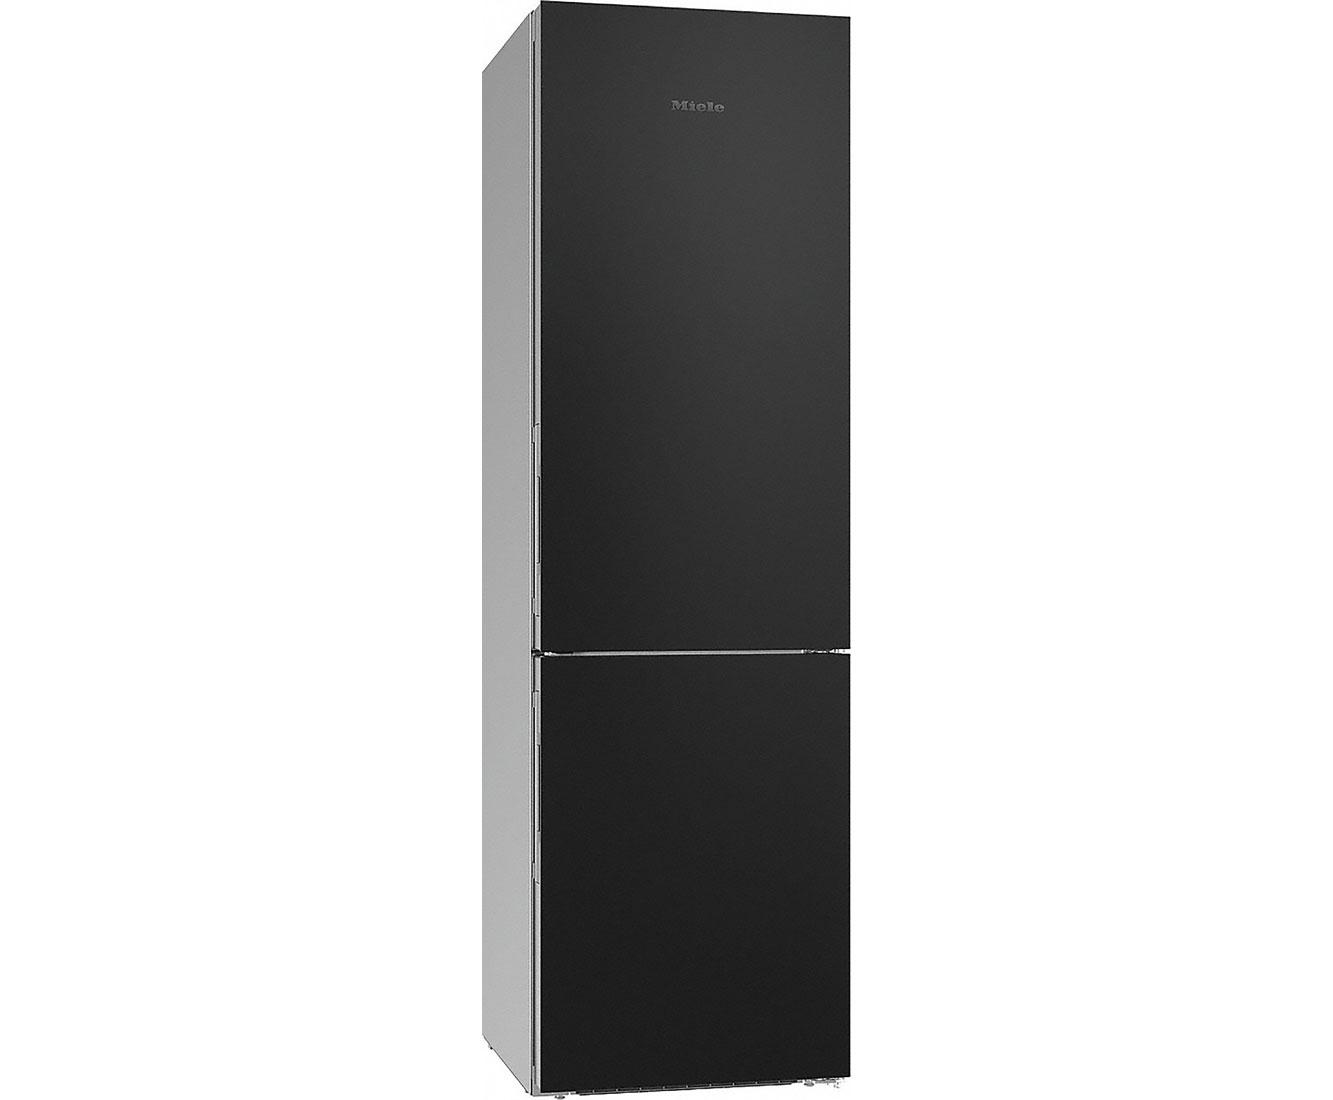 Kühlschrank No Frost A : Miele kfn d bb kühl gefrierkombination mit no frost er